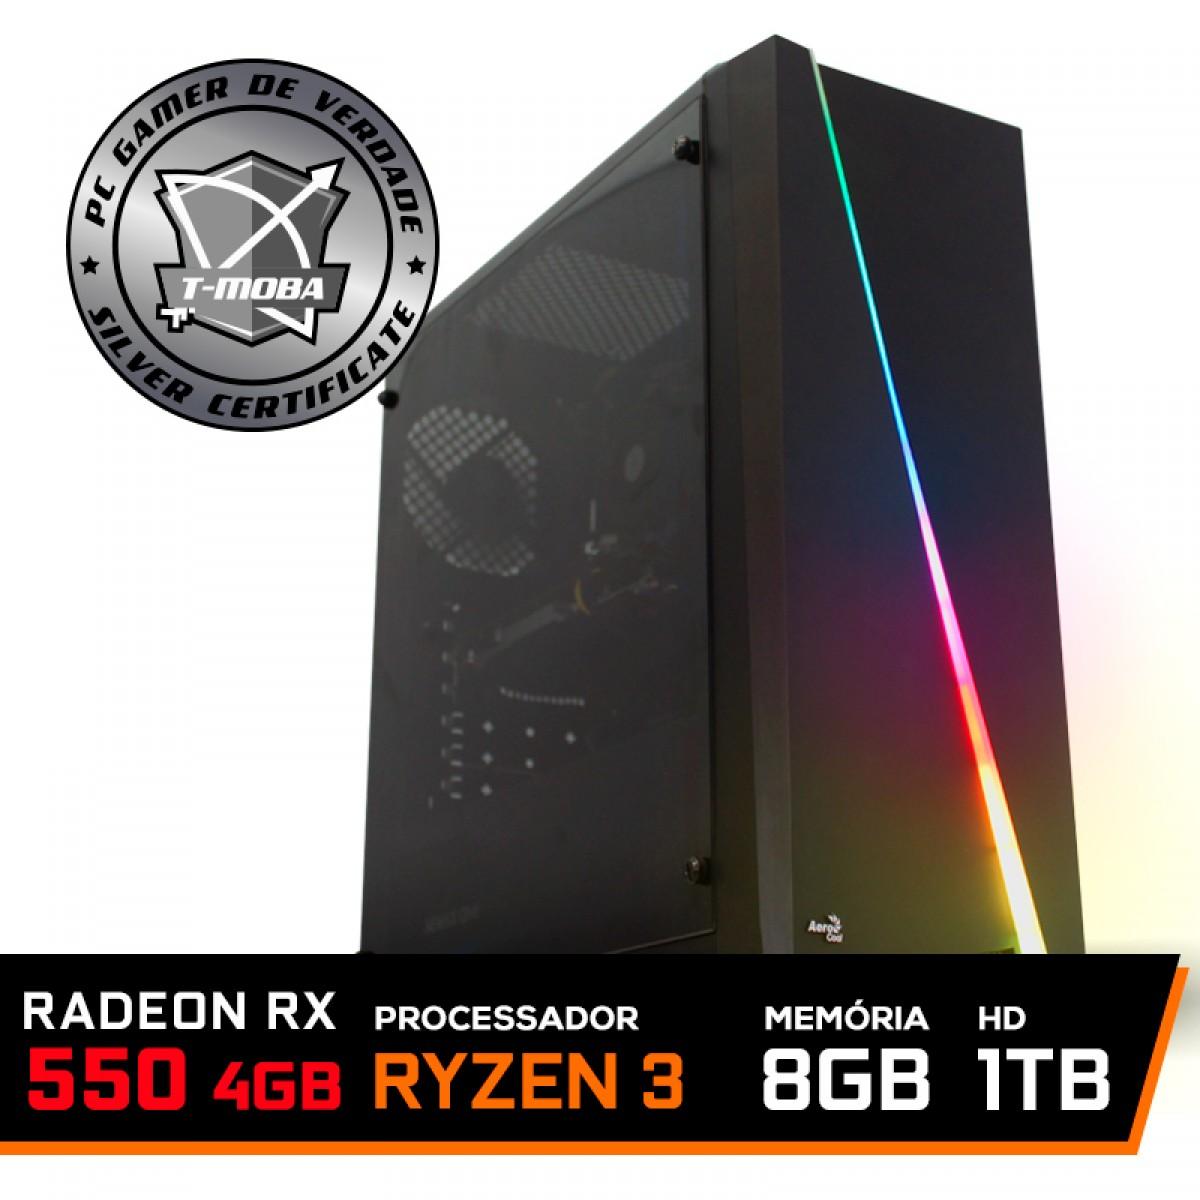 Pc Gamer T-Moba Dominator Lvl-2 AMD Ryzen 3 3200G / Radeon Rx 550 4GB / DDR4 8GB / HD 1TB